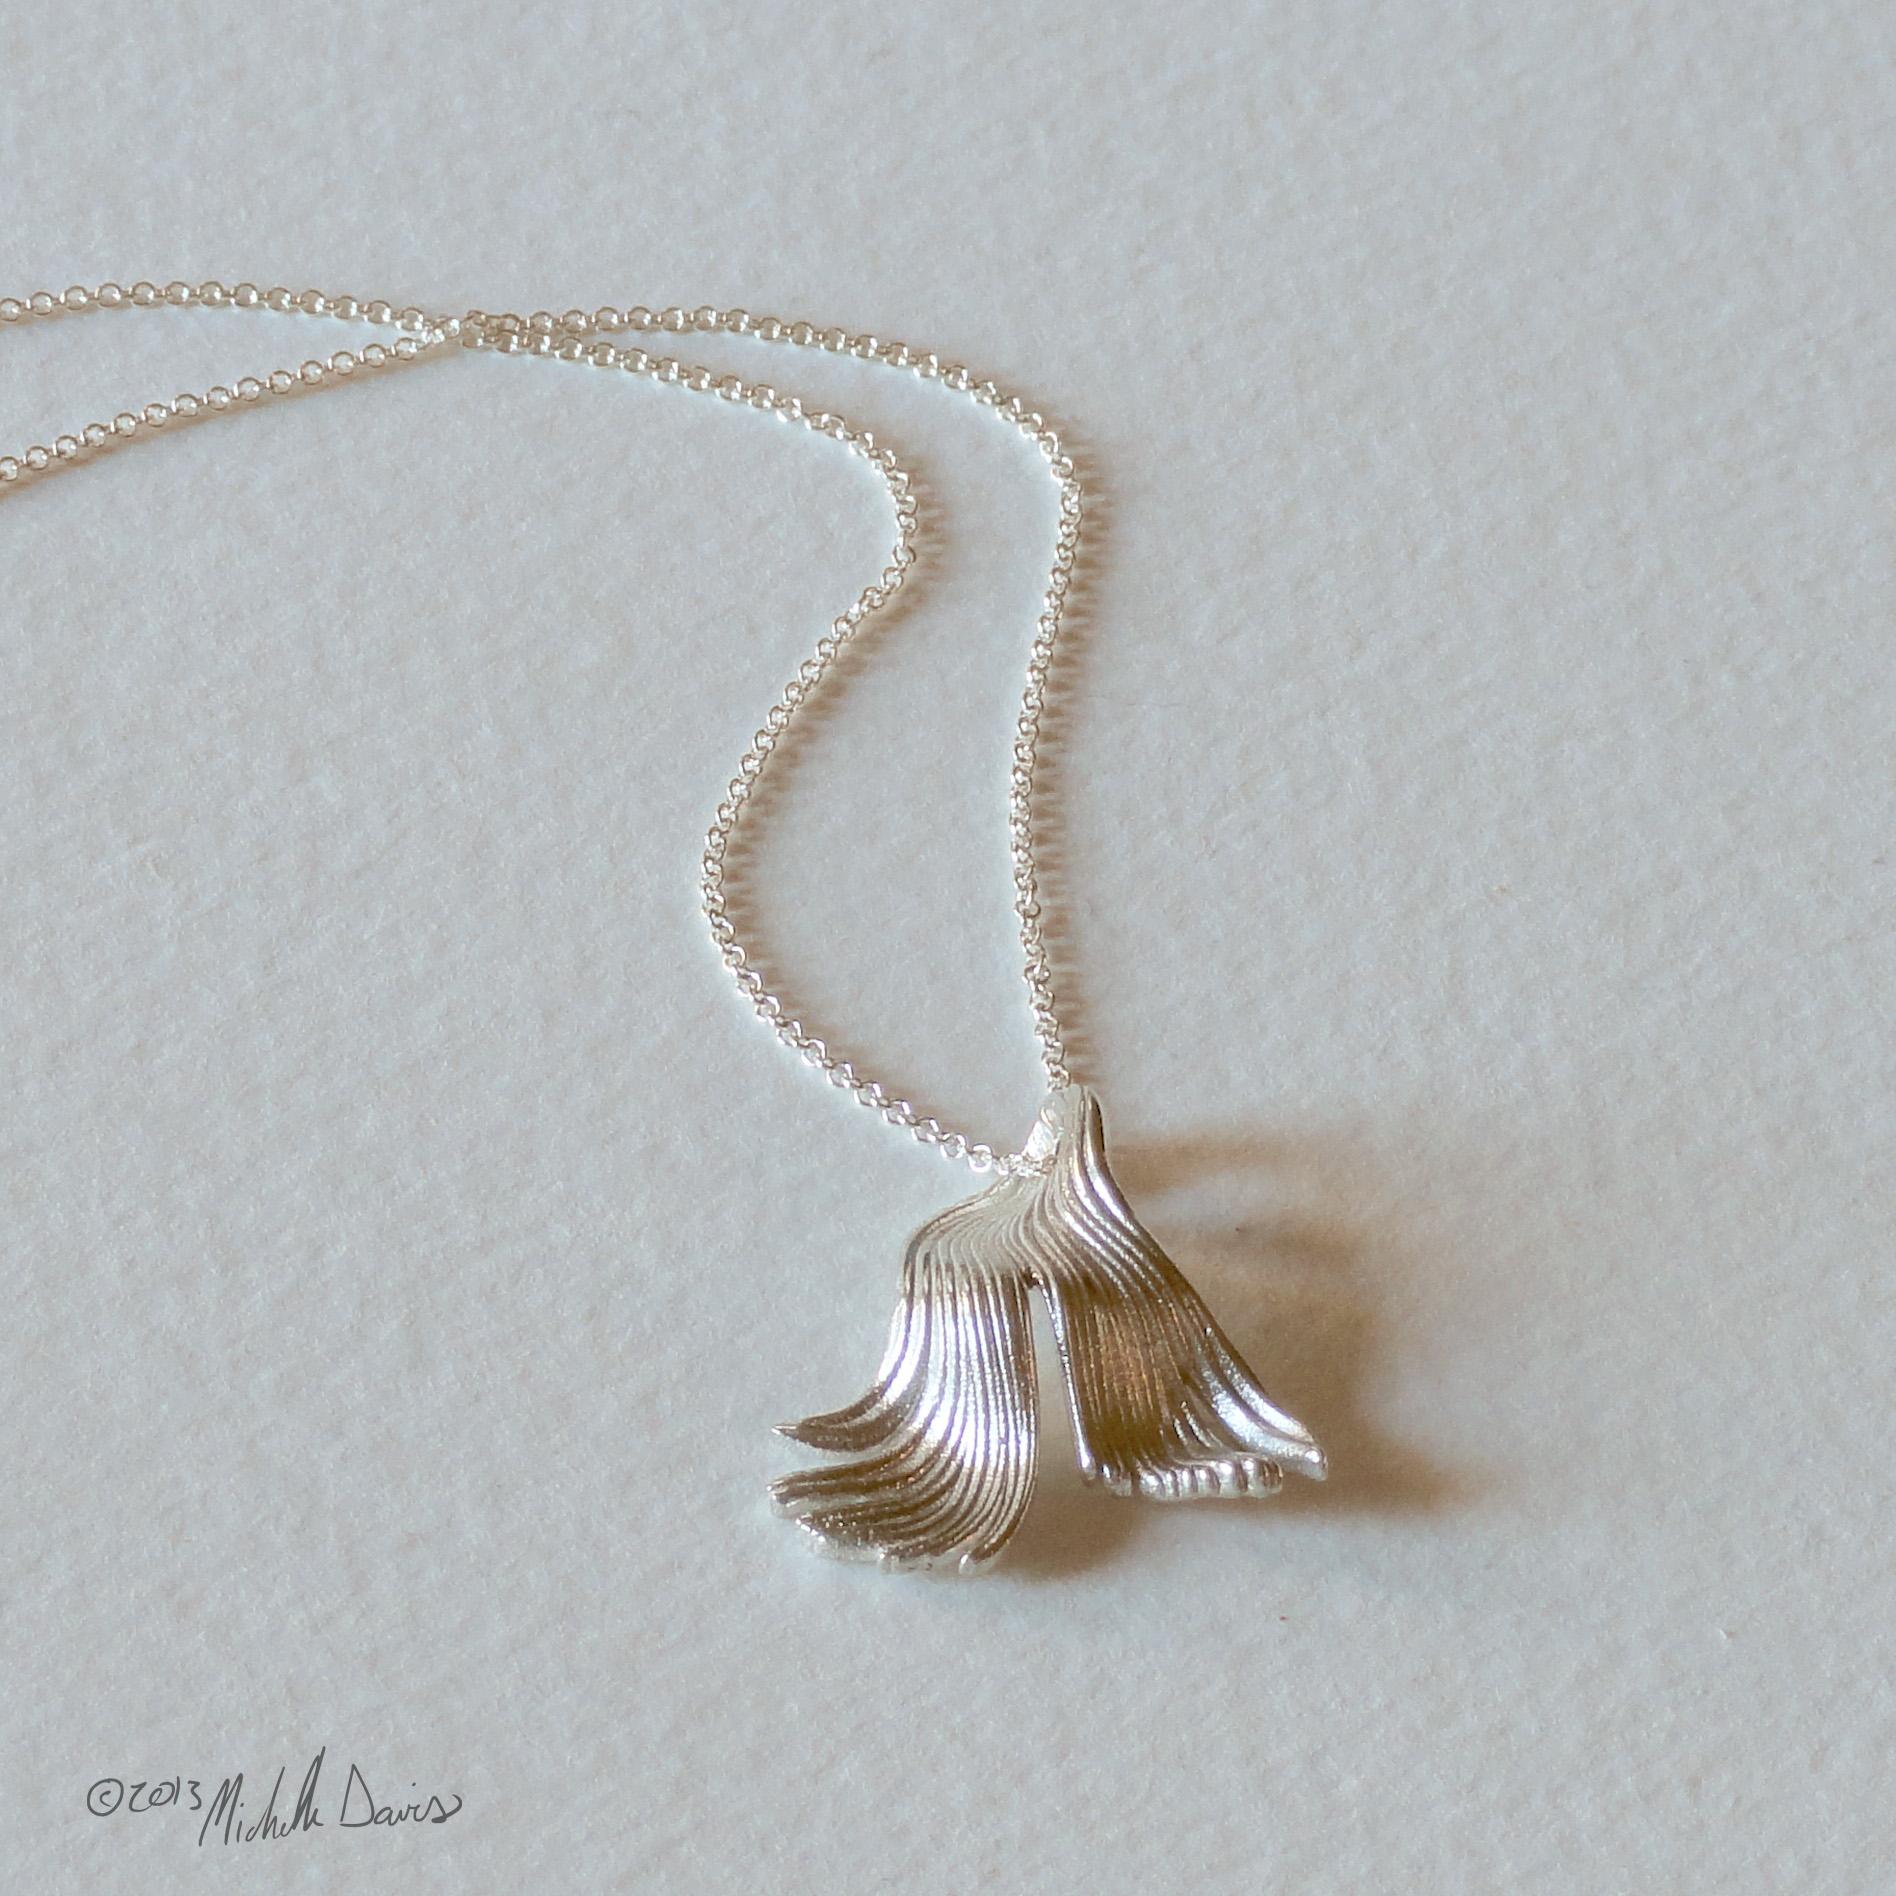 fishtail-pendant-ag-silverfront.jpg